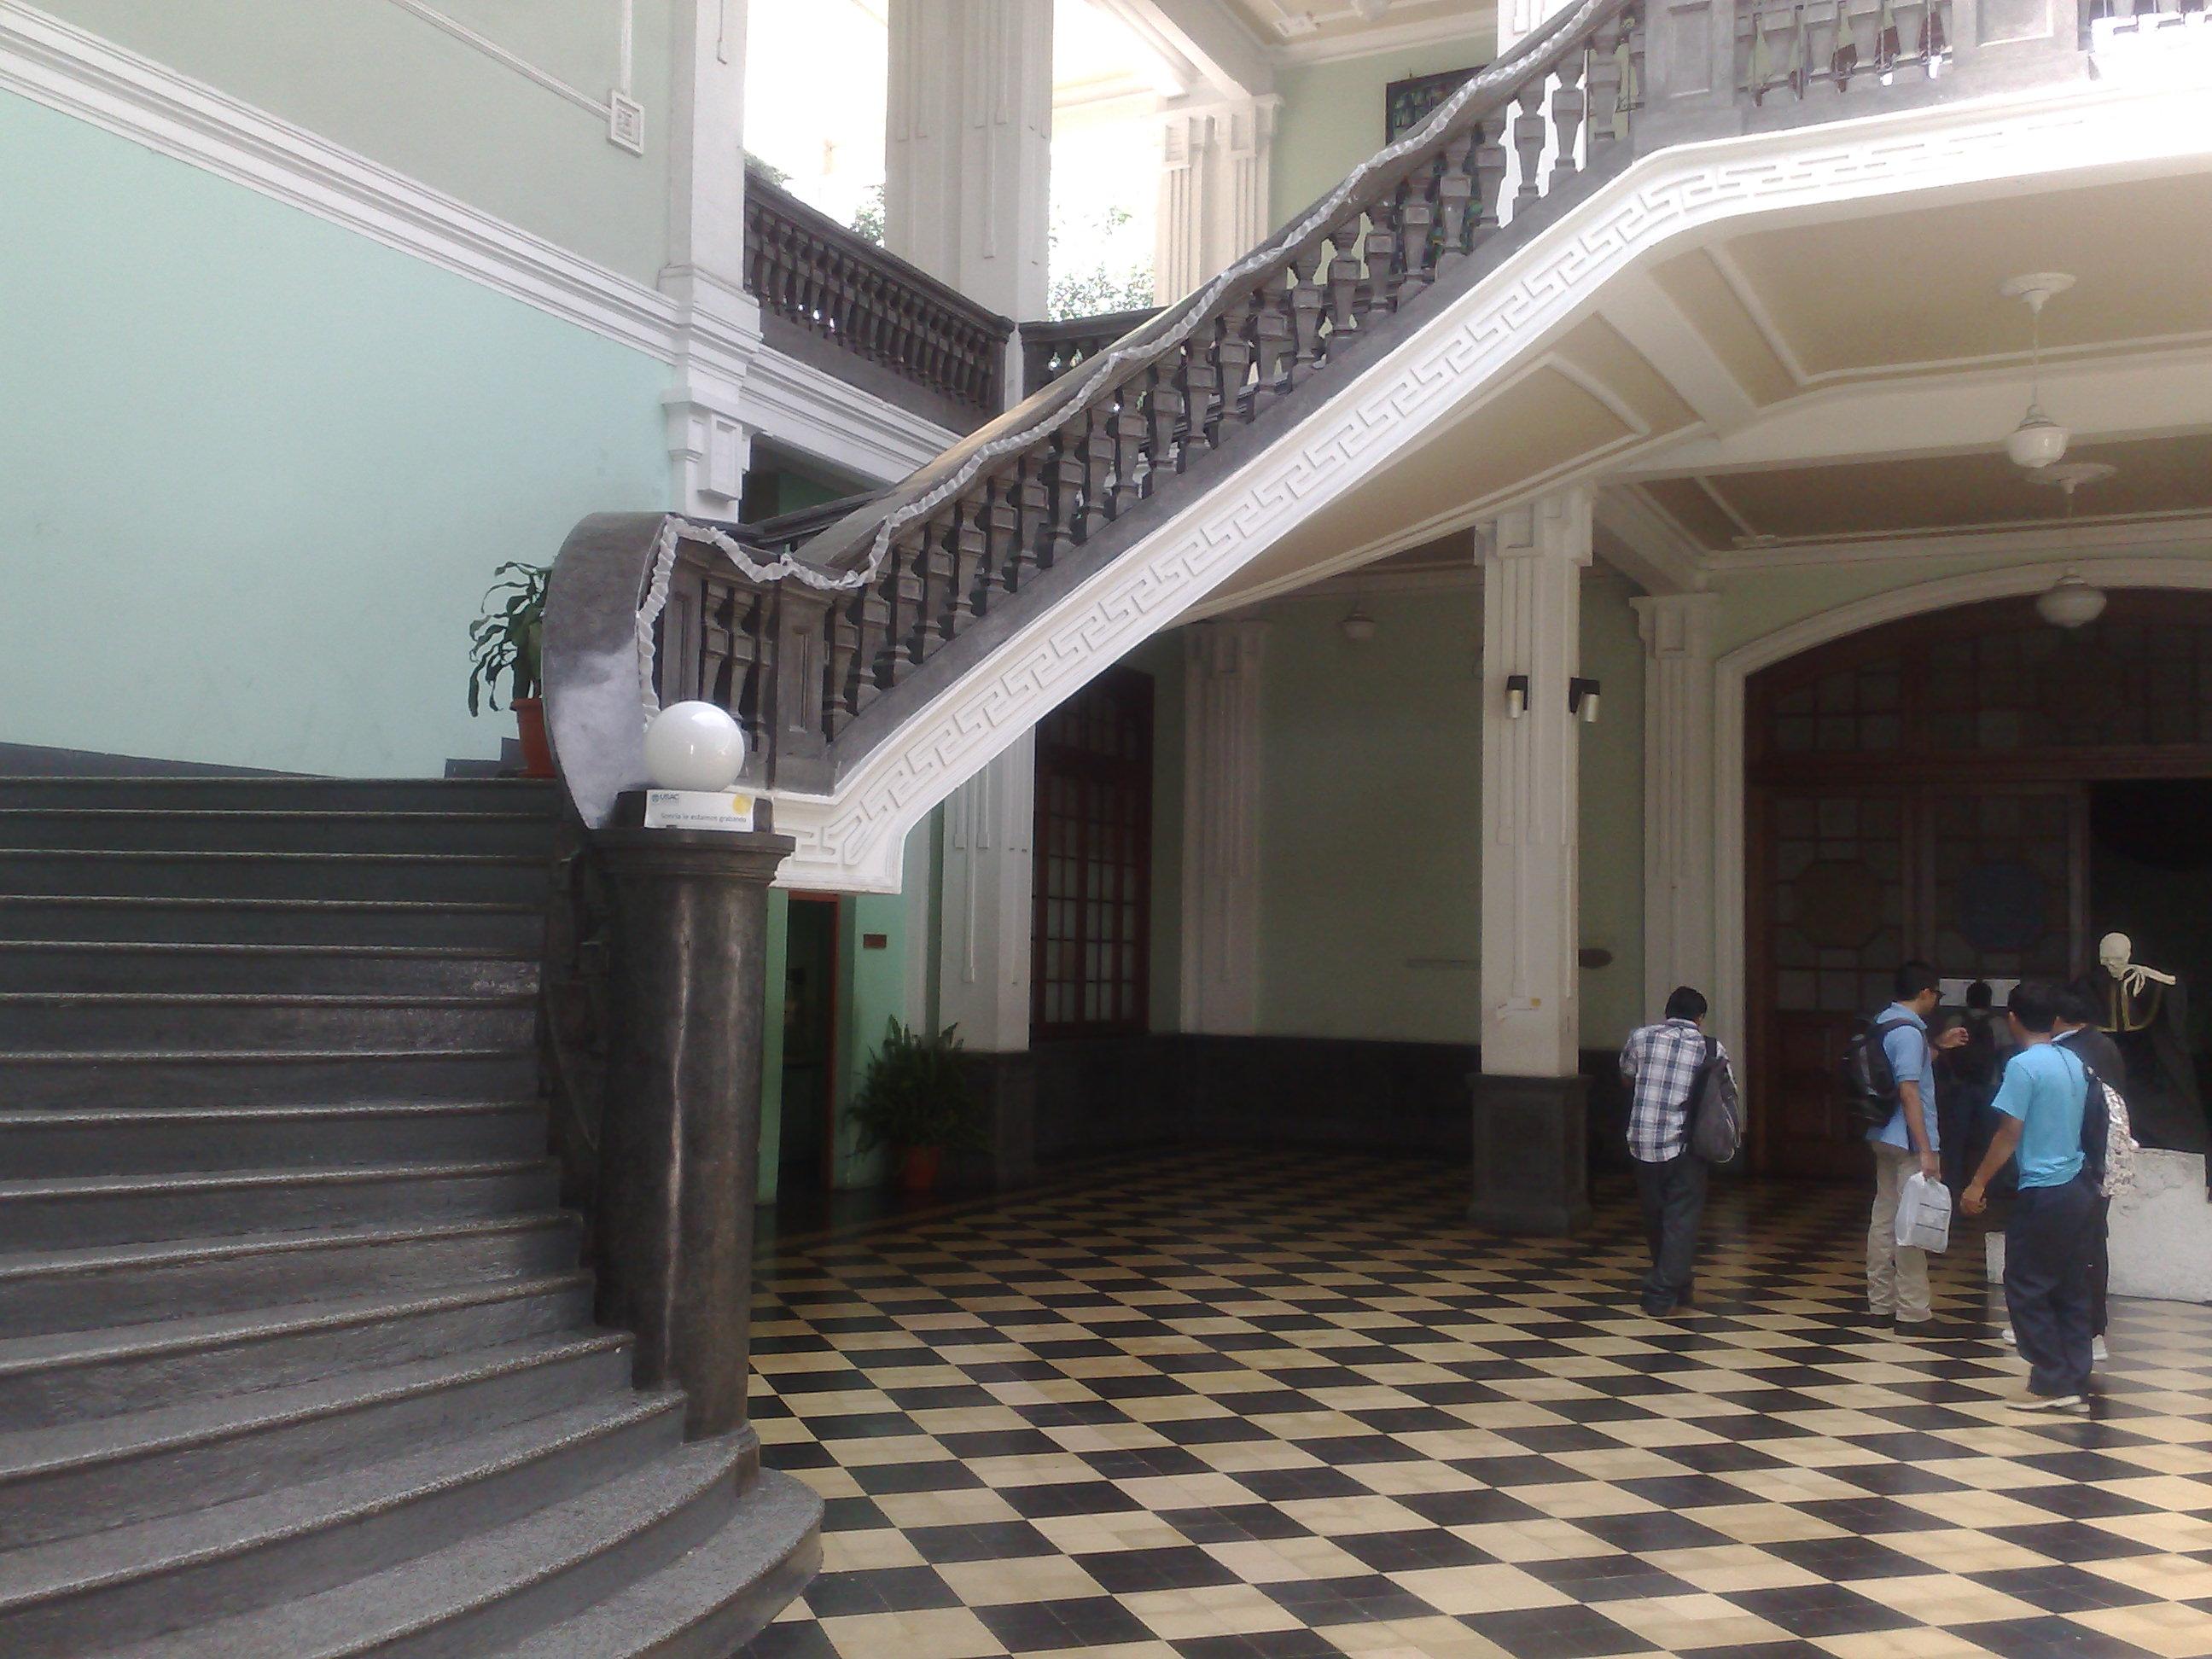 Entrance to the Paraninfo Universitario, Guatemala